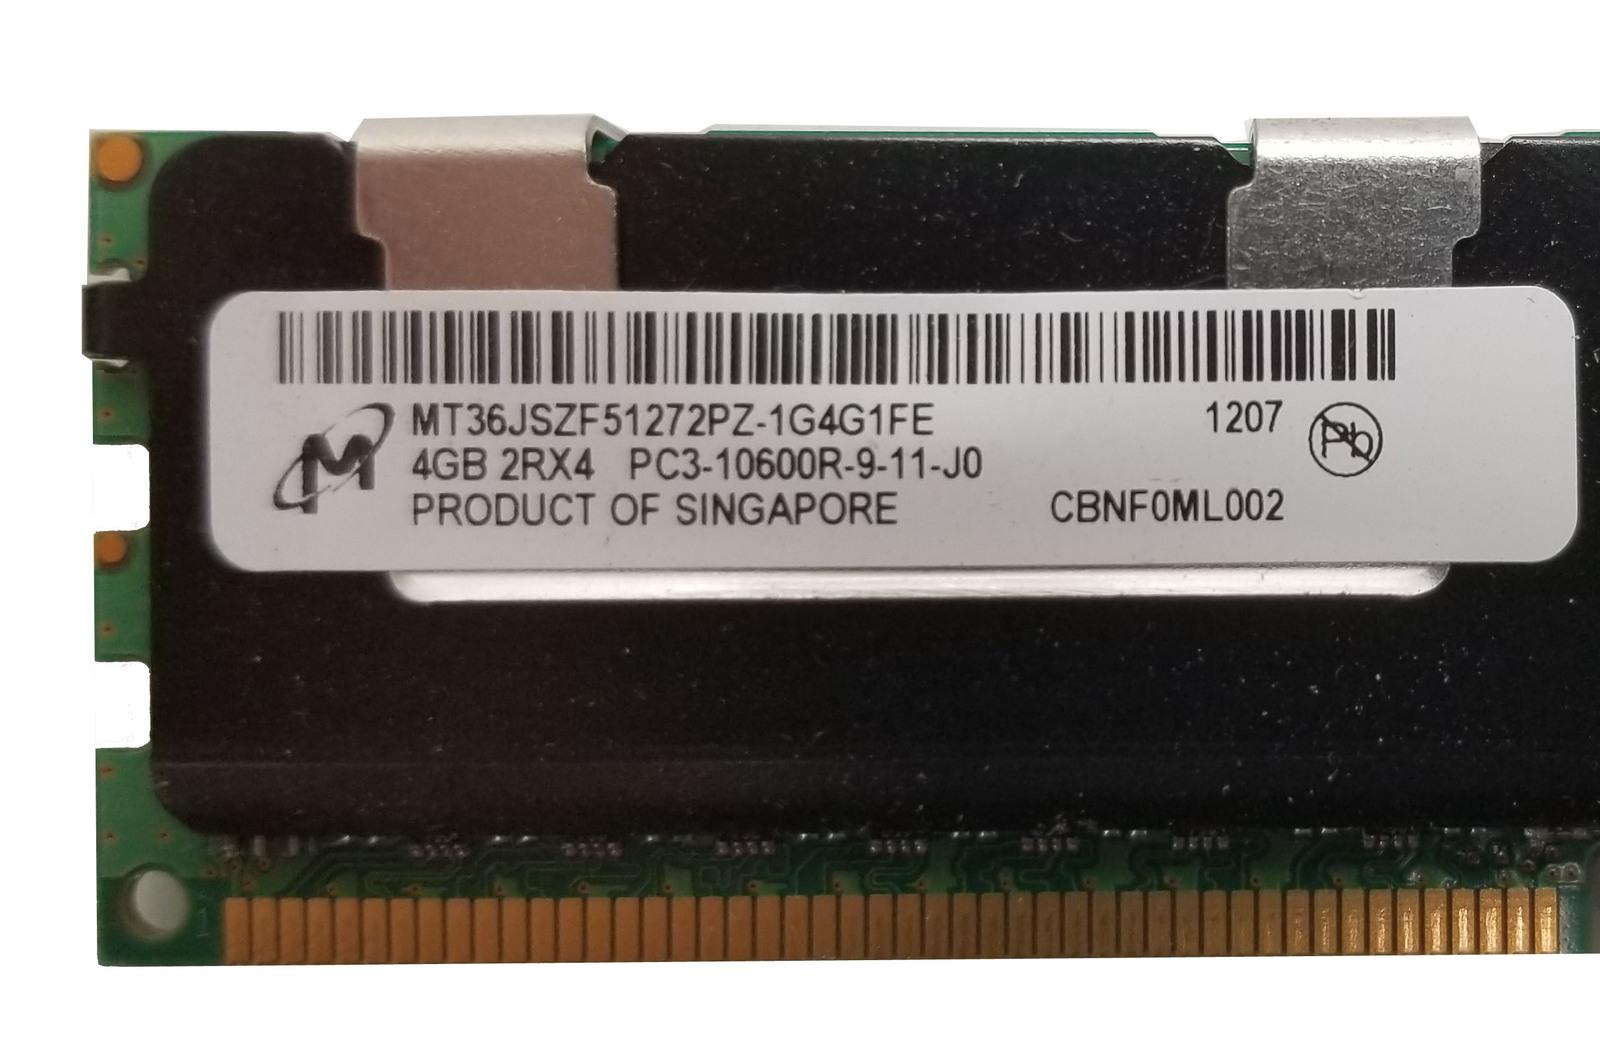 Micron 4GB 2RX4 PC3-10600R Server RAM (MT36JSZF5127PZ-1G4G1FE) Bin:7